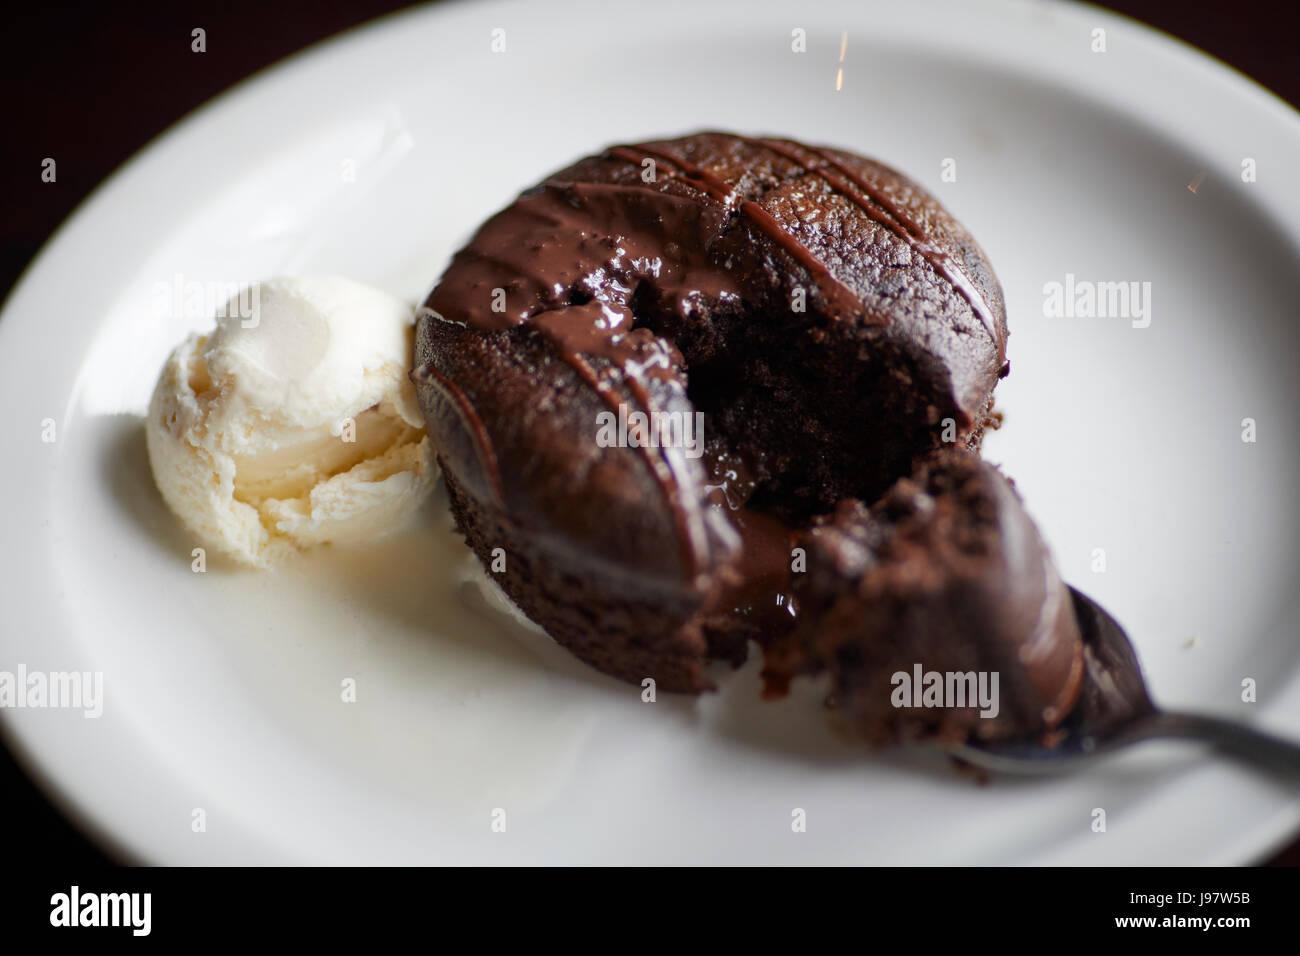 Traditional British chocolate cake with ice-cream - Stock Image